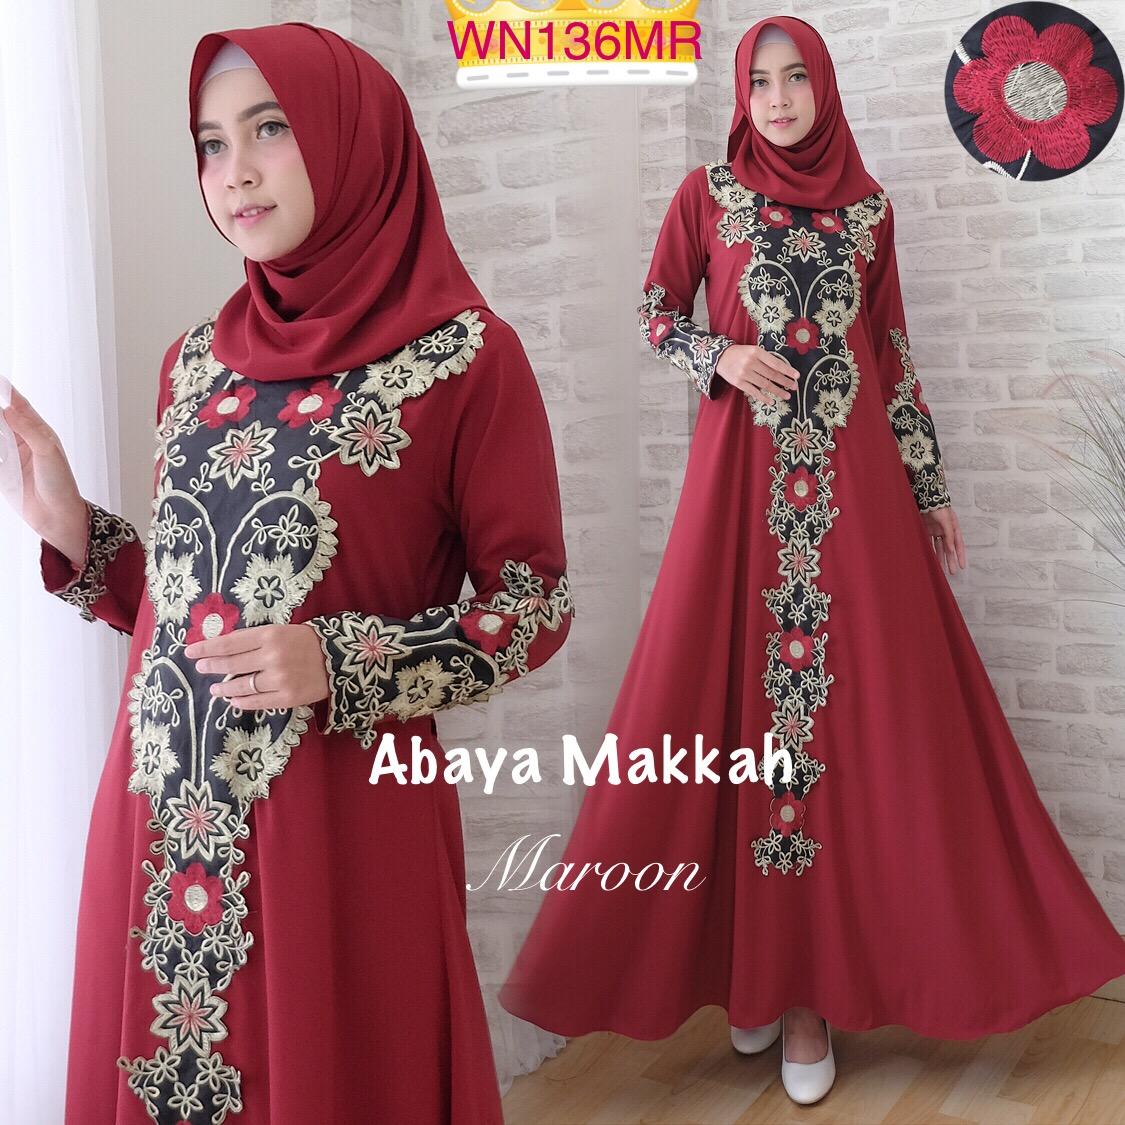 Gamis Abaya Bordir Makkah Size L Baju Muslim Pesta Modern Butik Busana